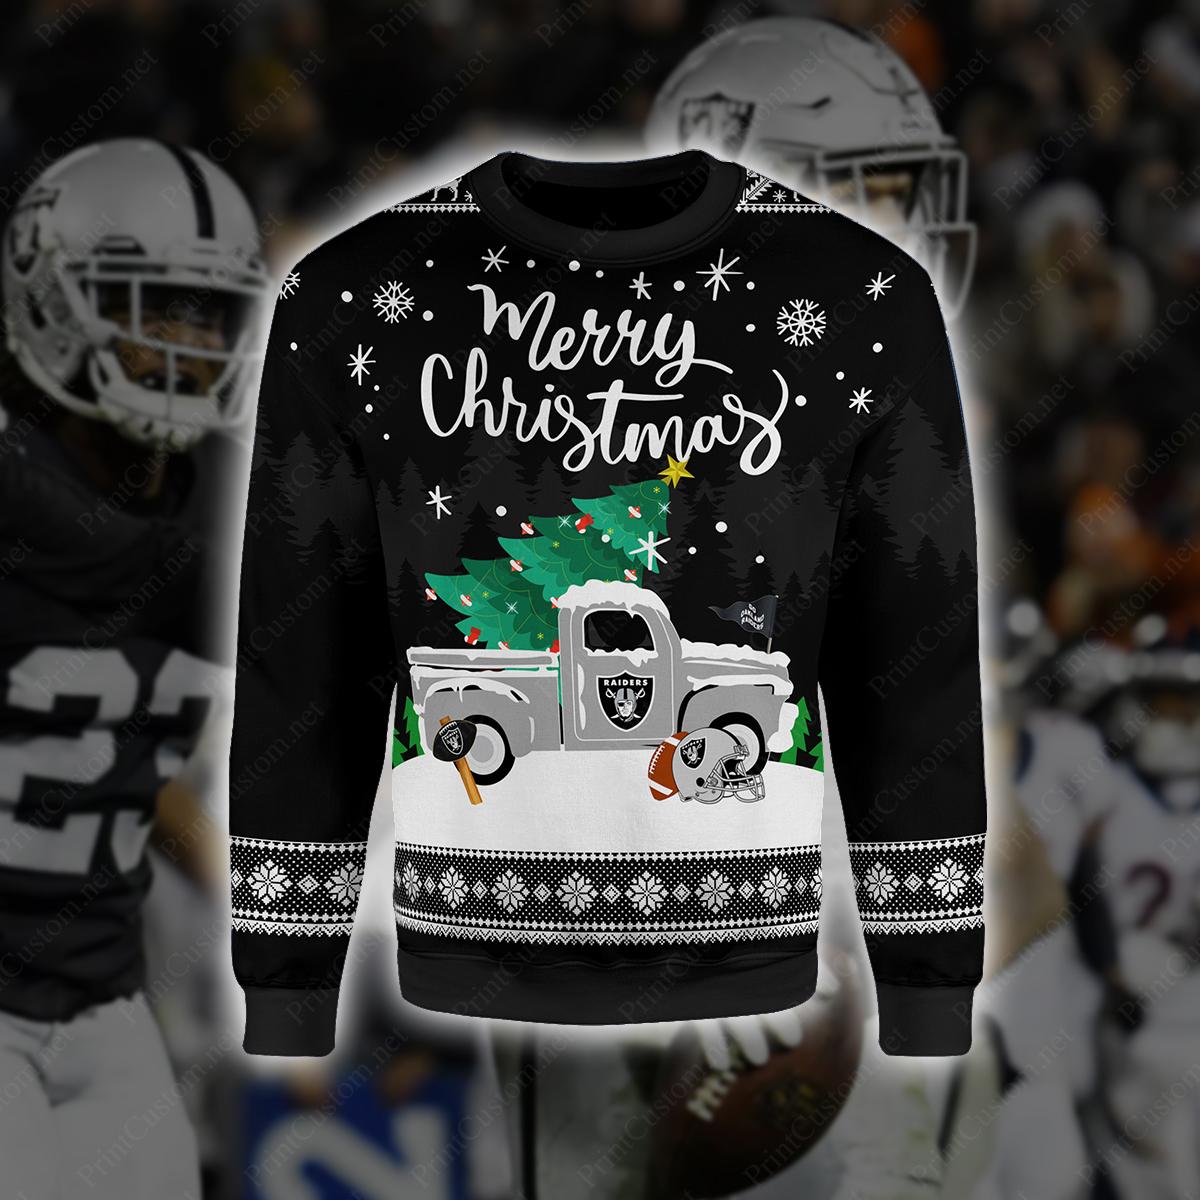 Merry christmas oakland raiders full printing shirt 1